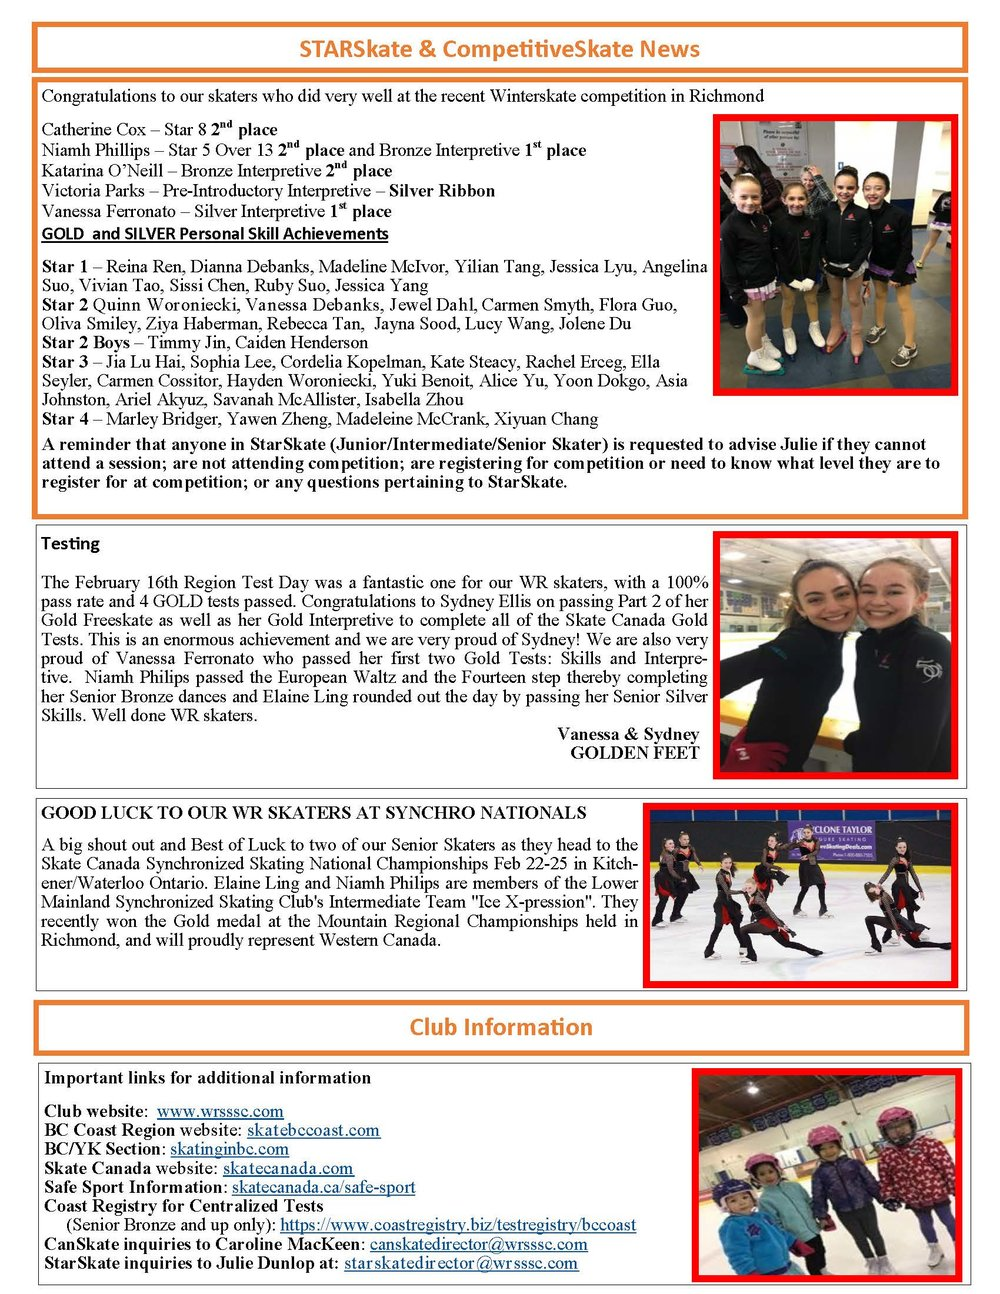 WRSSSC NewsletterFeb_Page_2.jpg